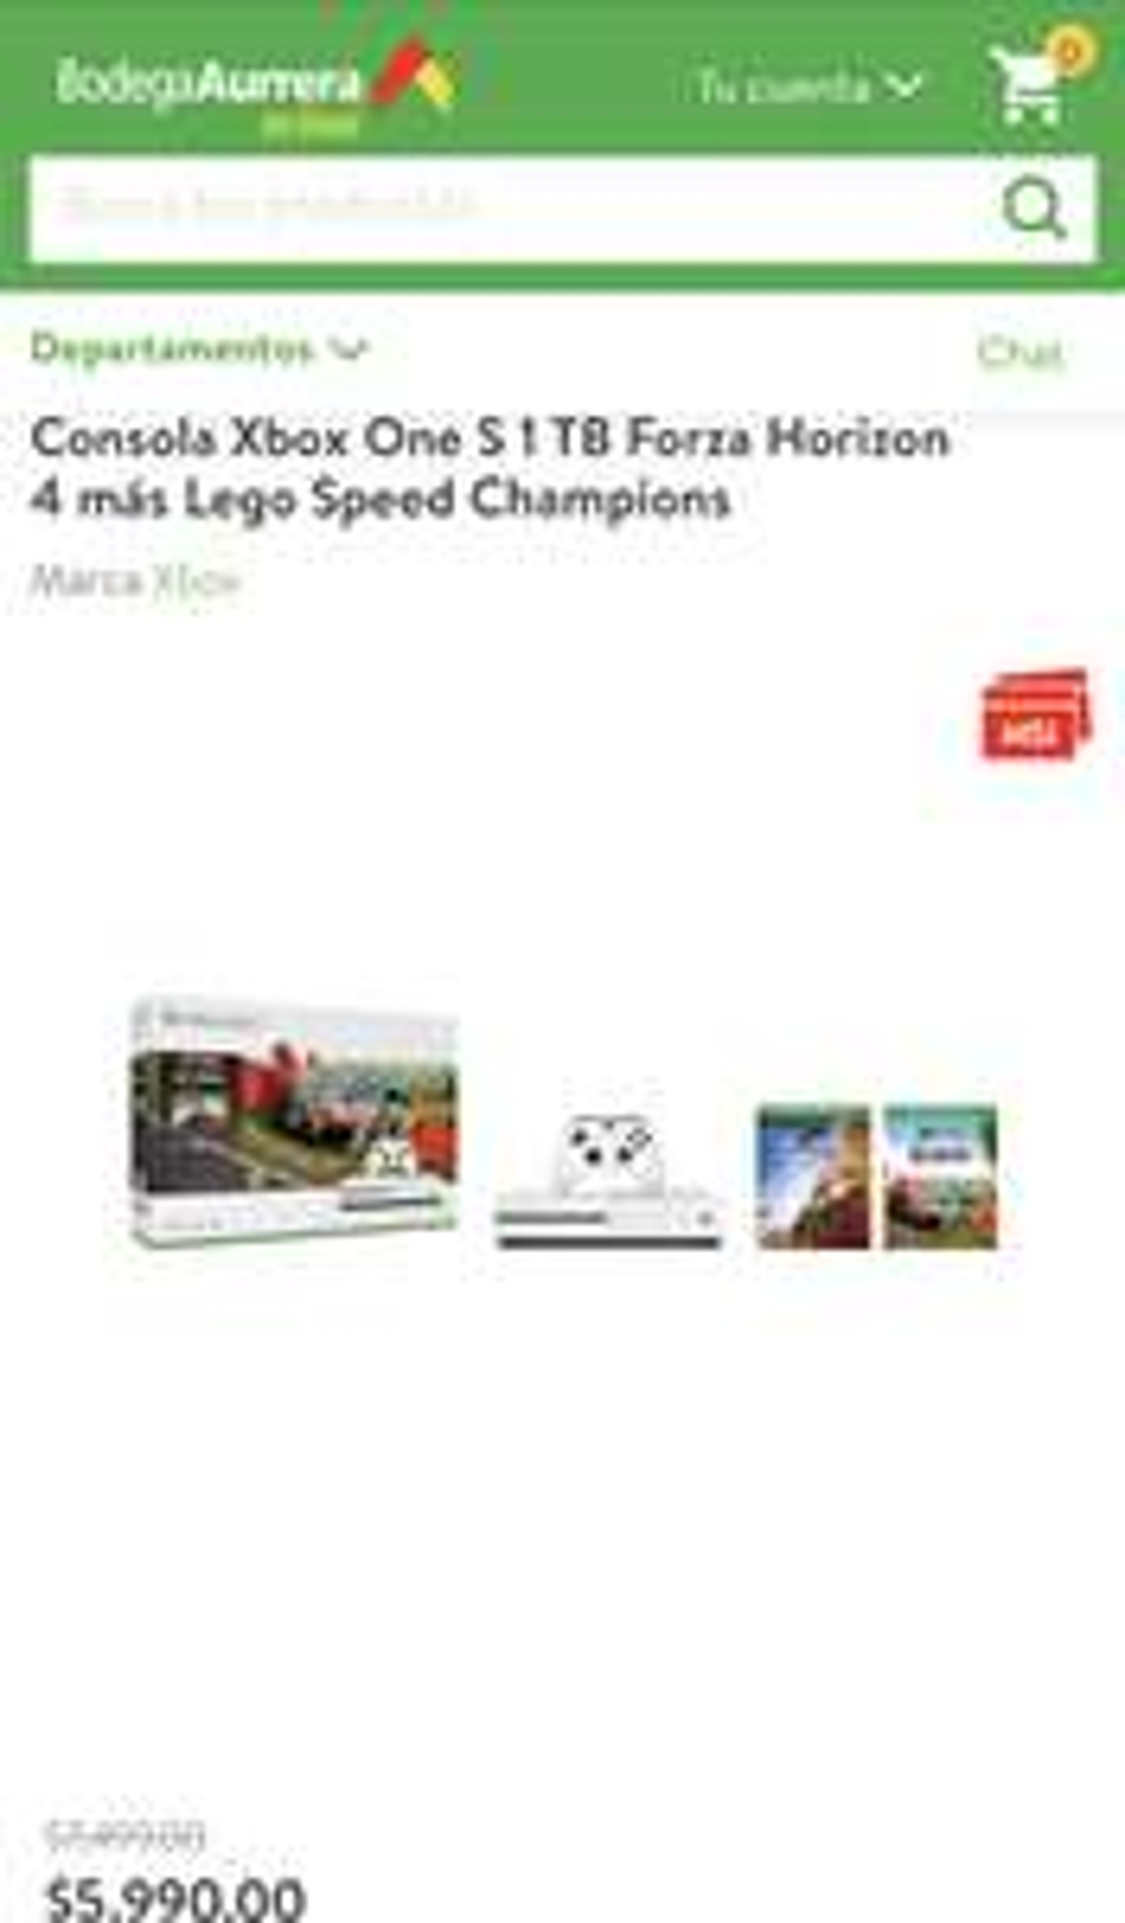 Bodega Aurrerá: Xbox One S 1 TB